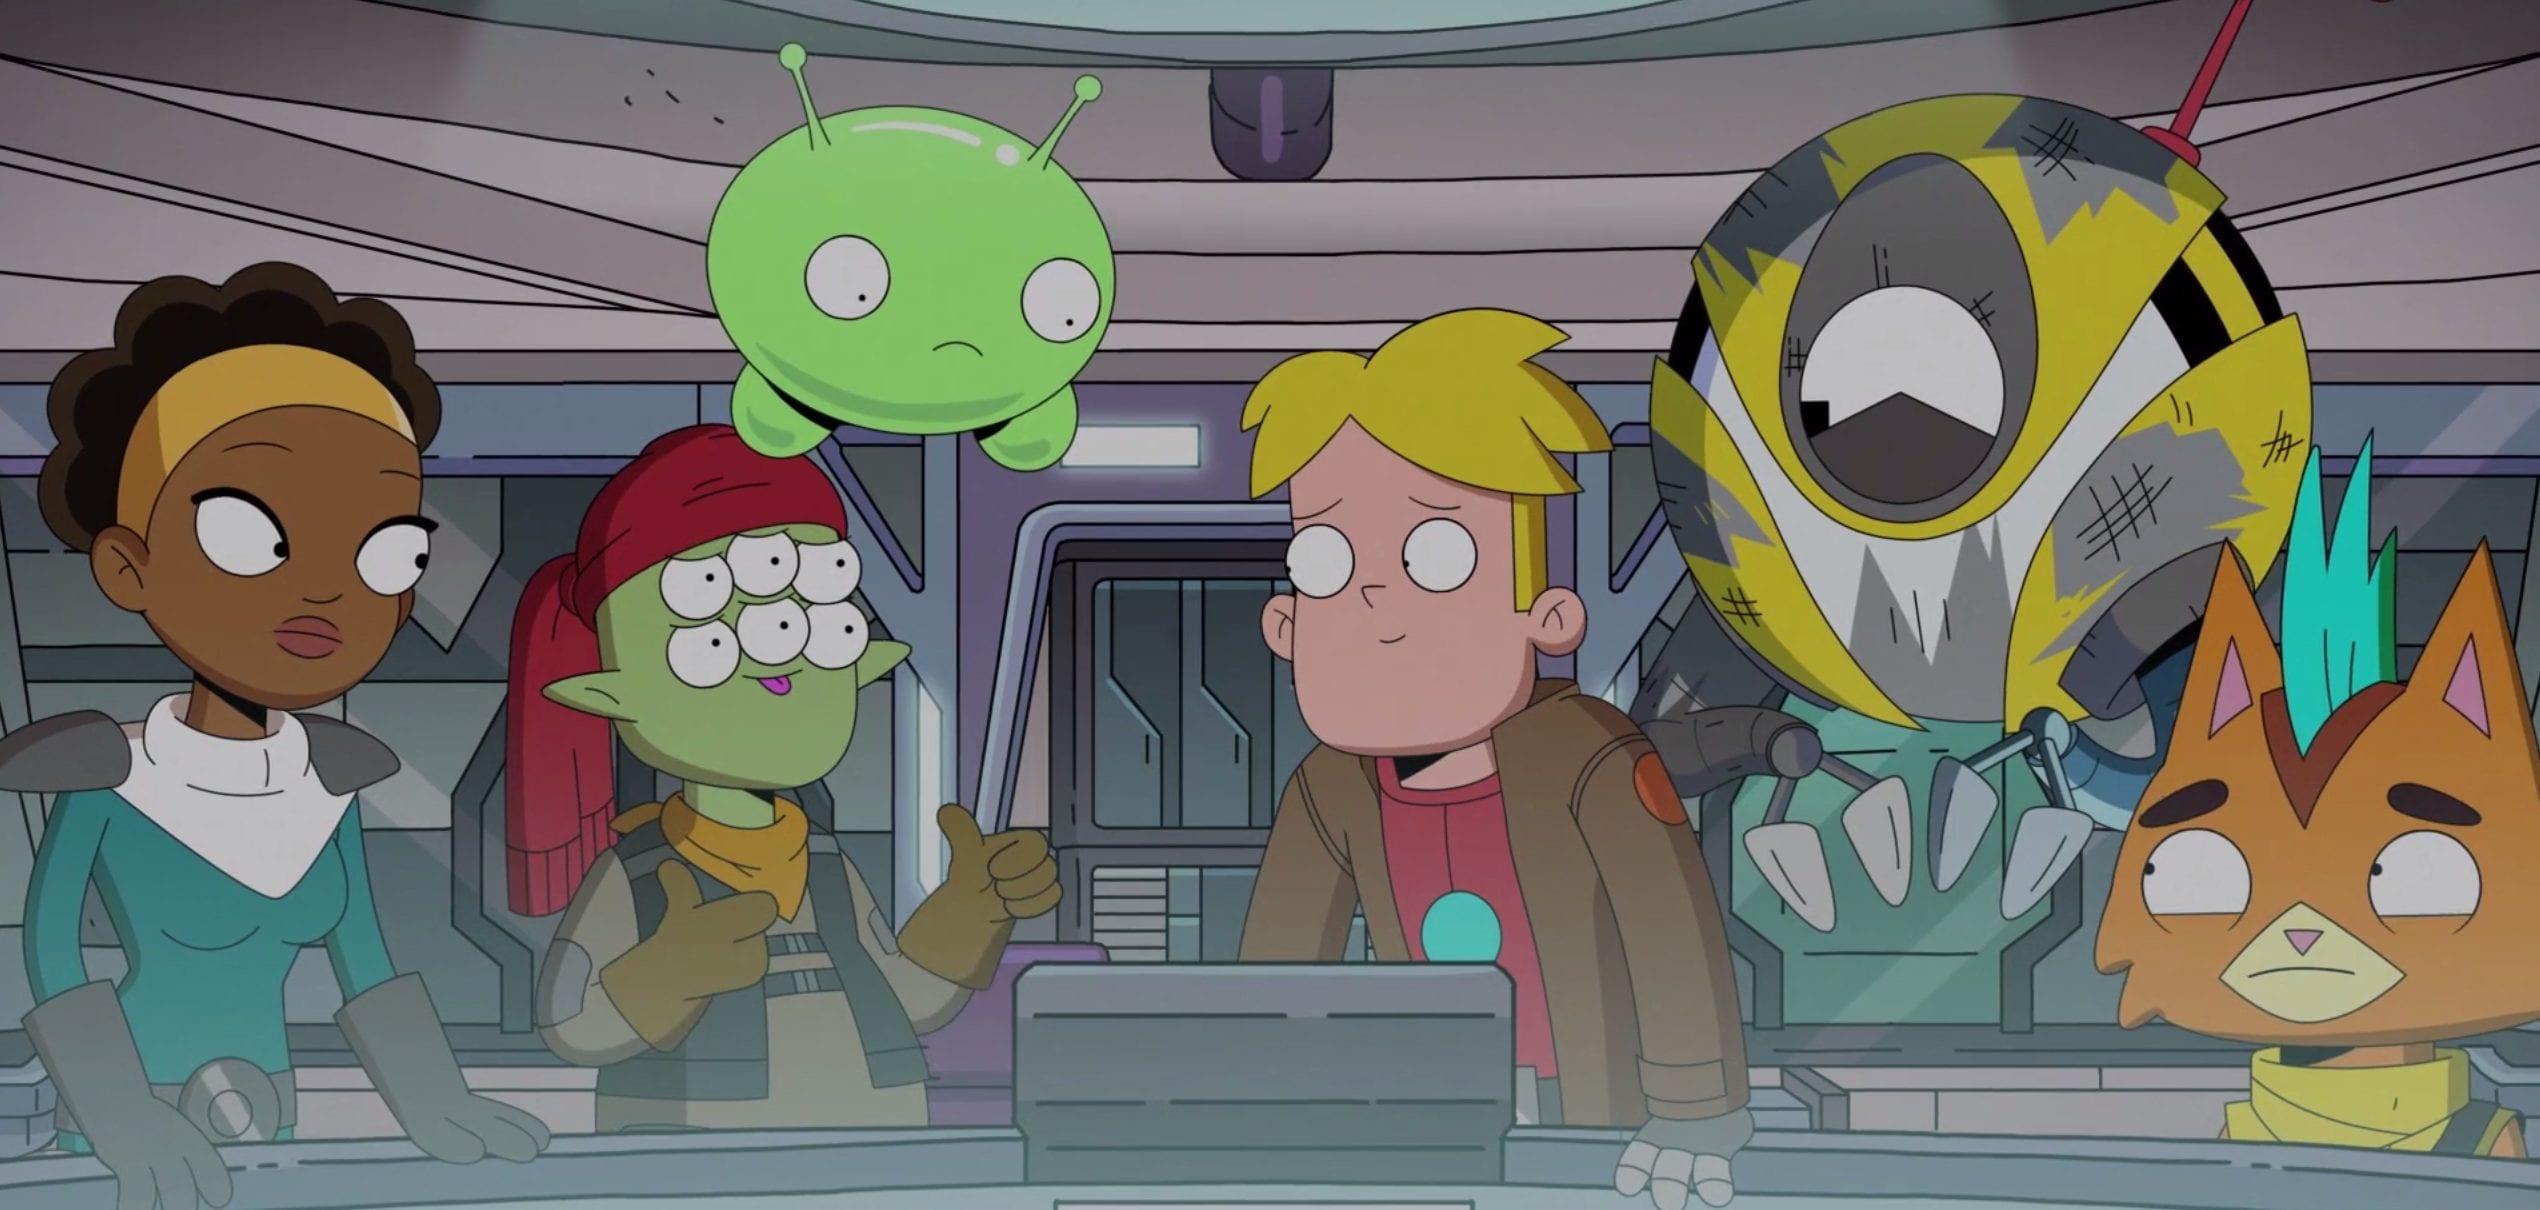 Final Space Season 2 Episode 4